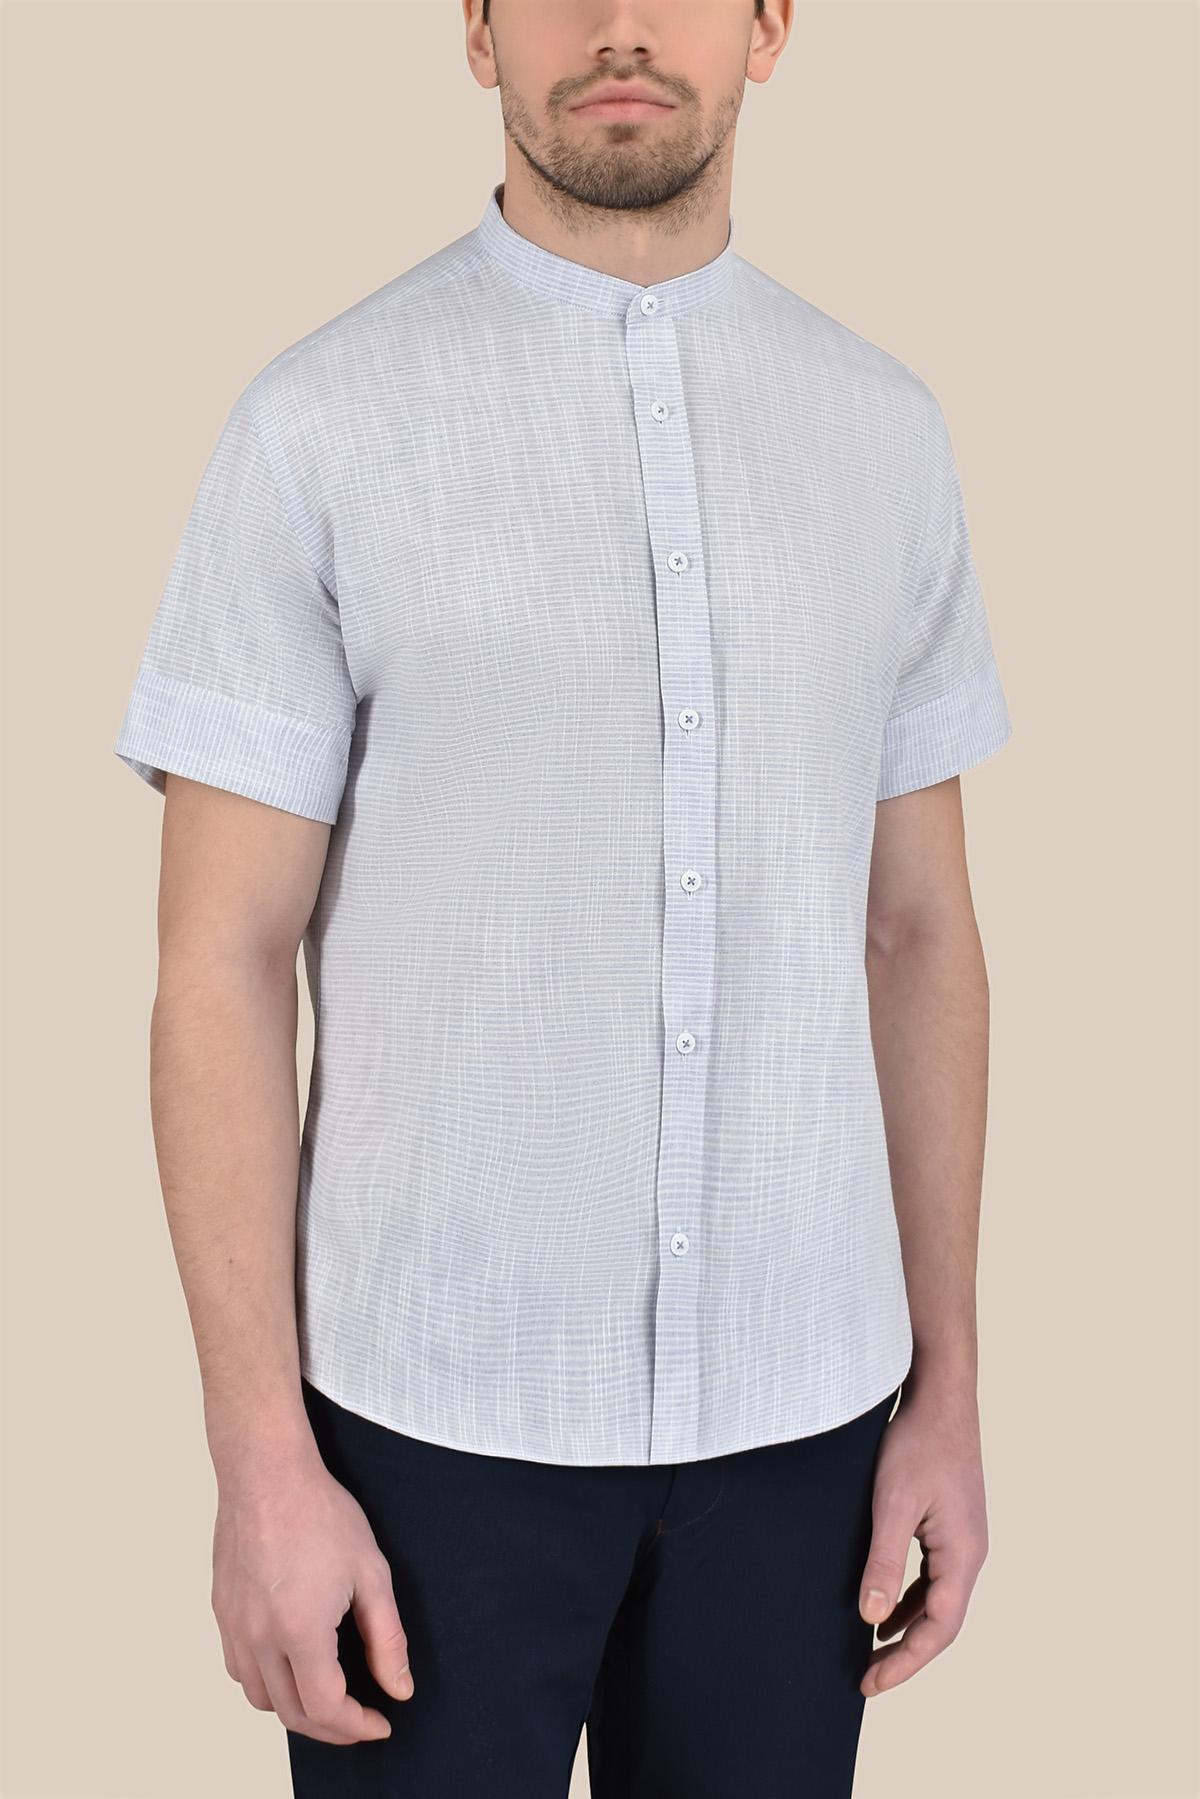 Рубашка  структурная, голубая  Vaismann 20142